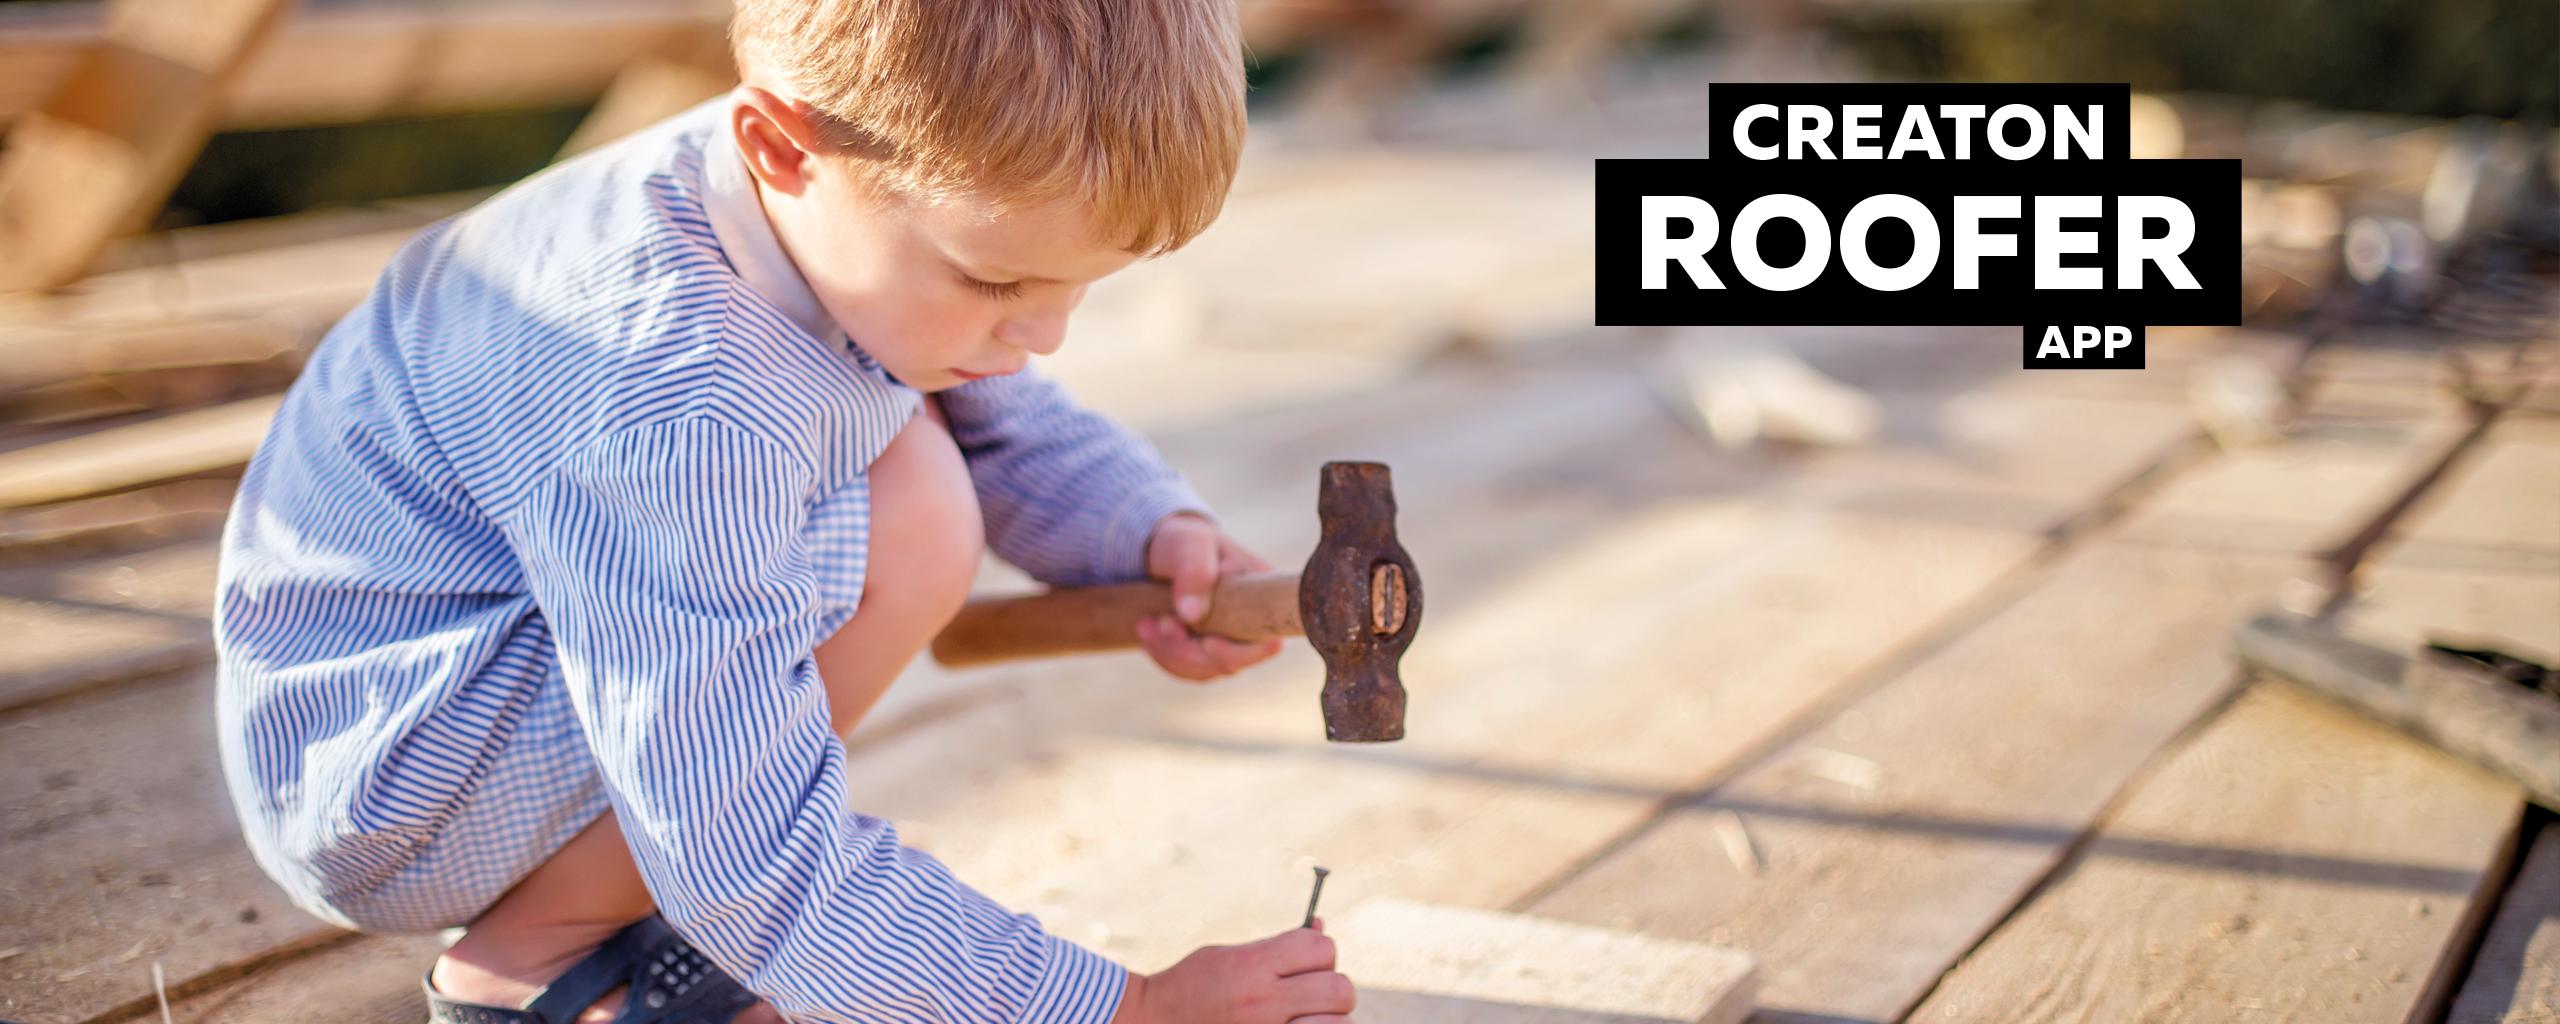 CREATON roofer app